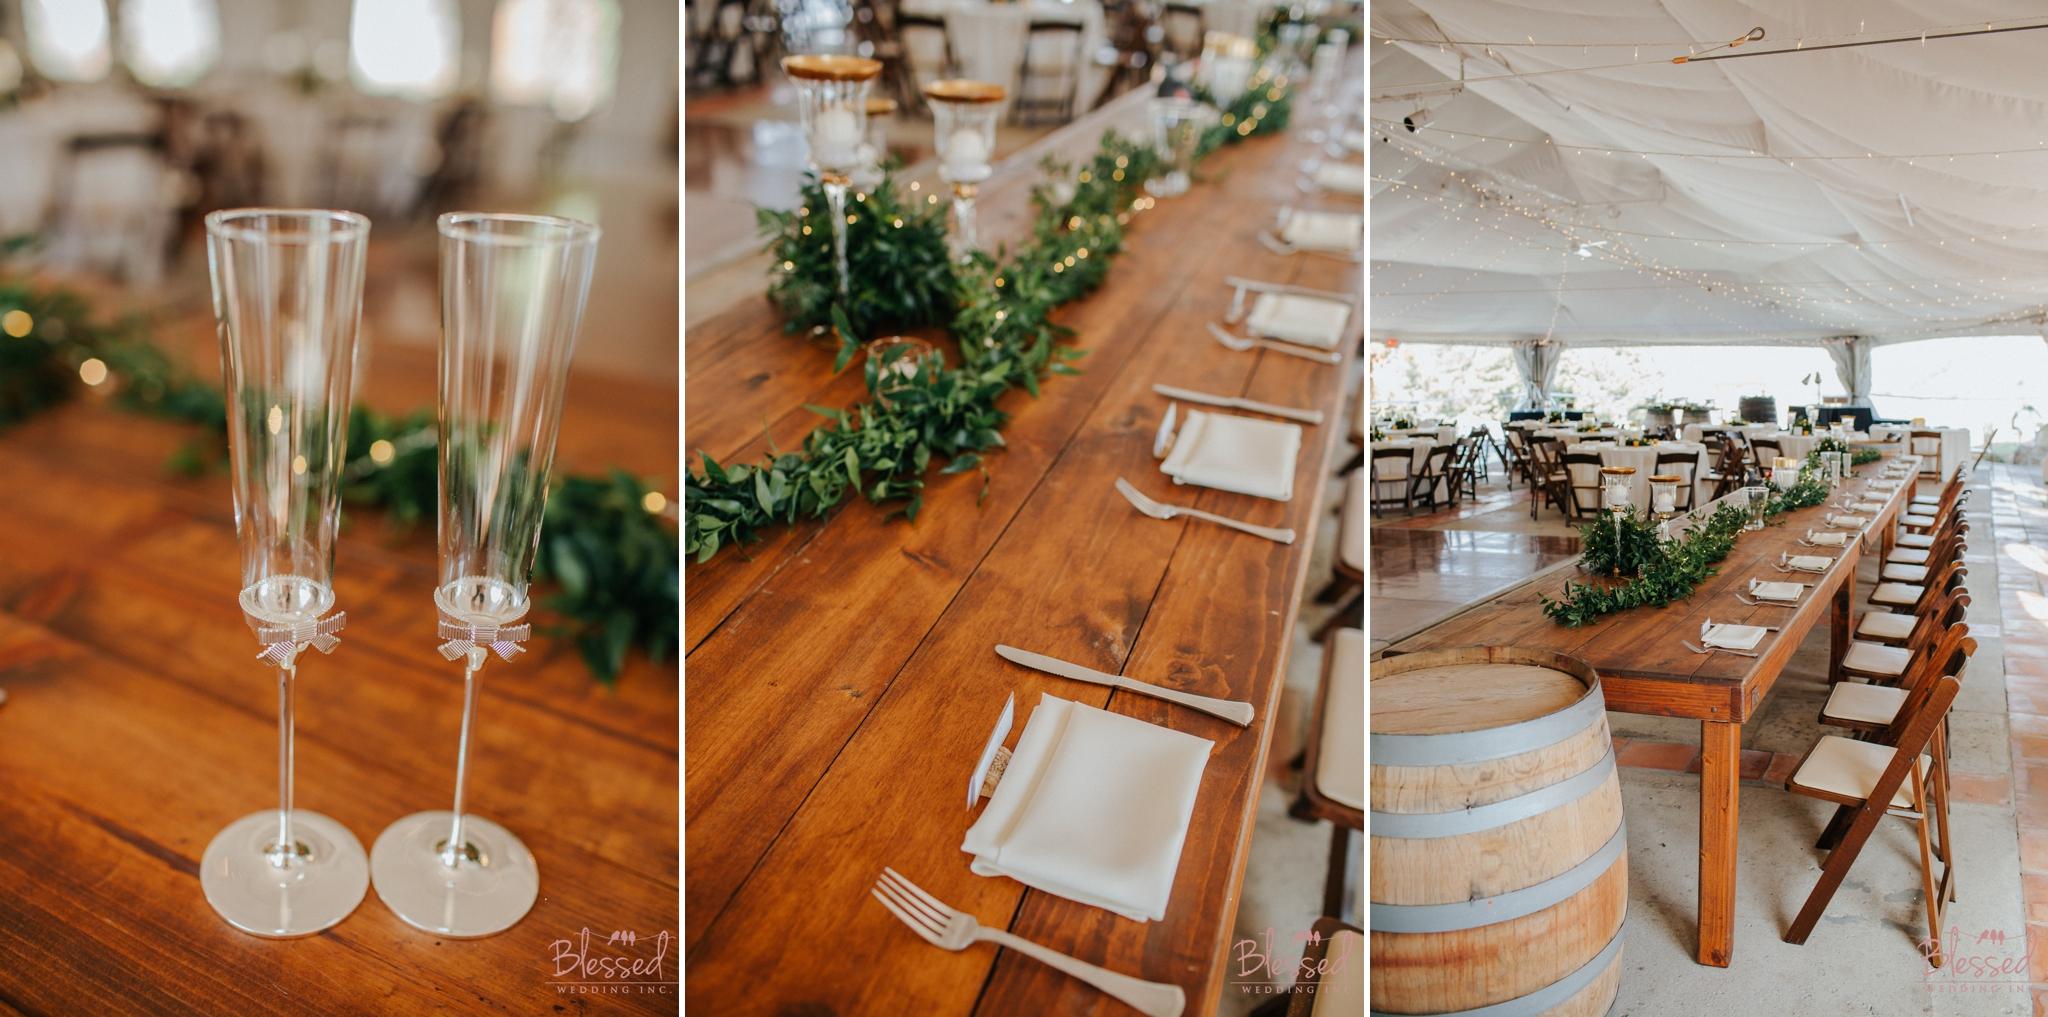 Orfila Vinery Wedding by Blessed Wedding Photography 41.jpg